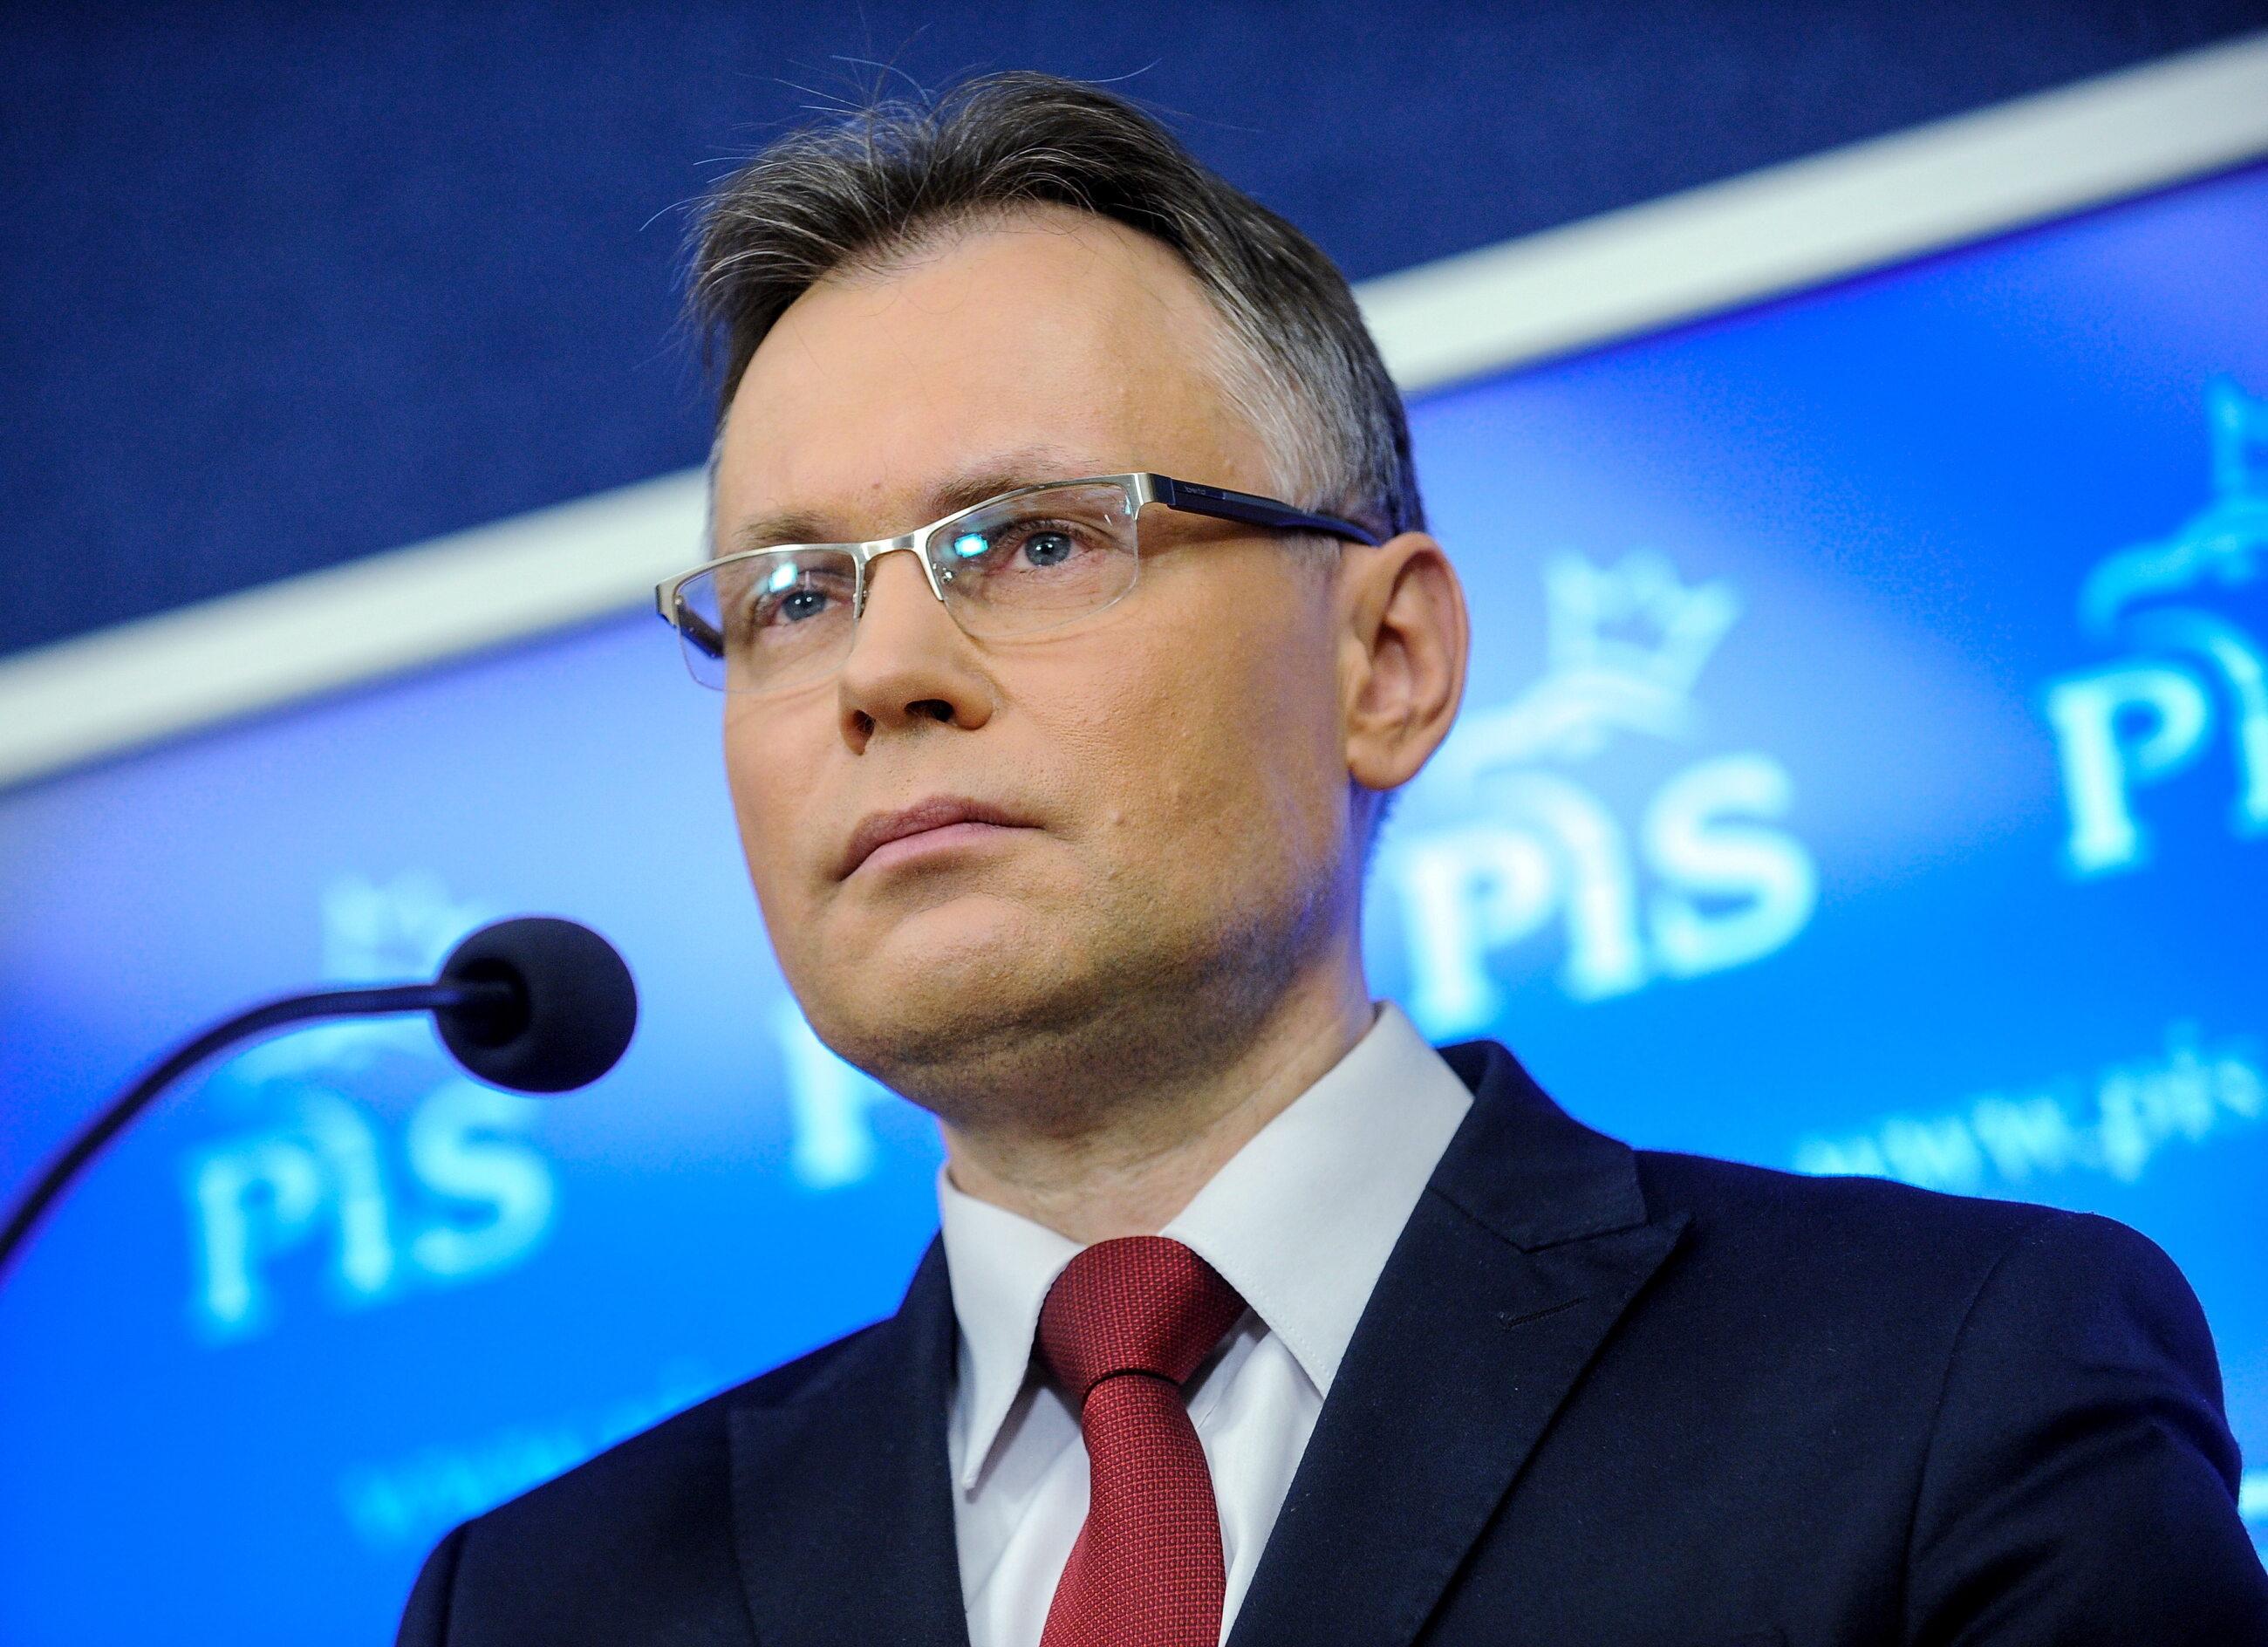 Arkadiusz Mularczyk (PiS)